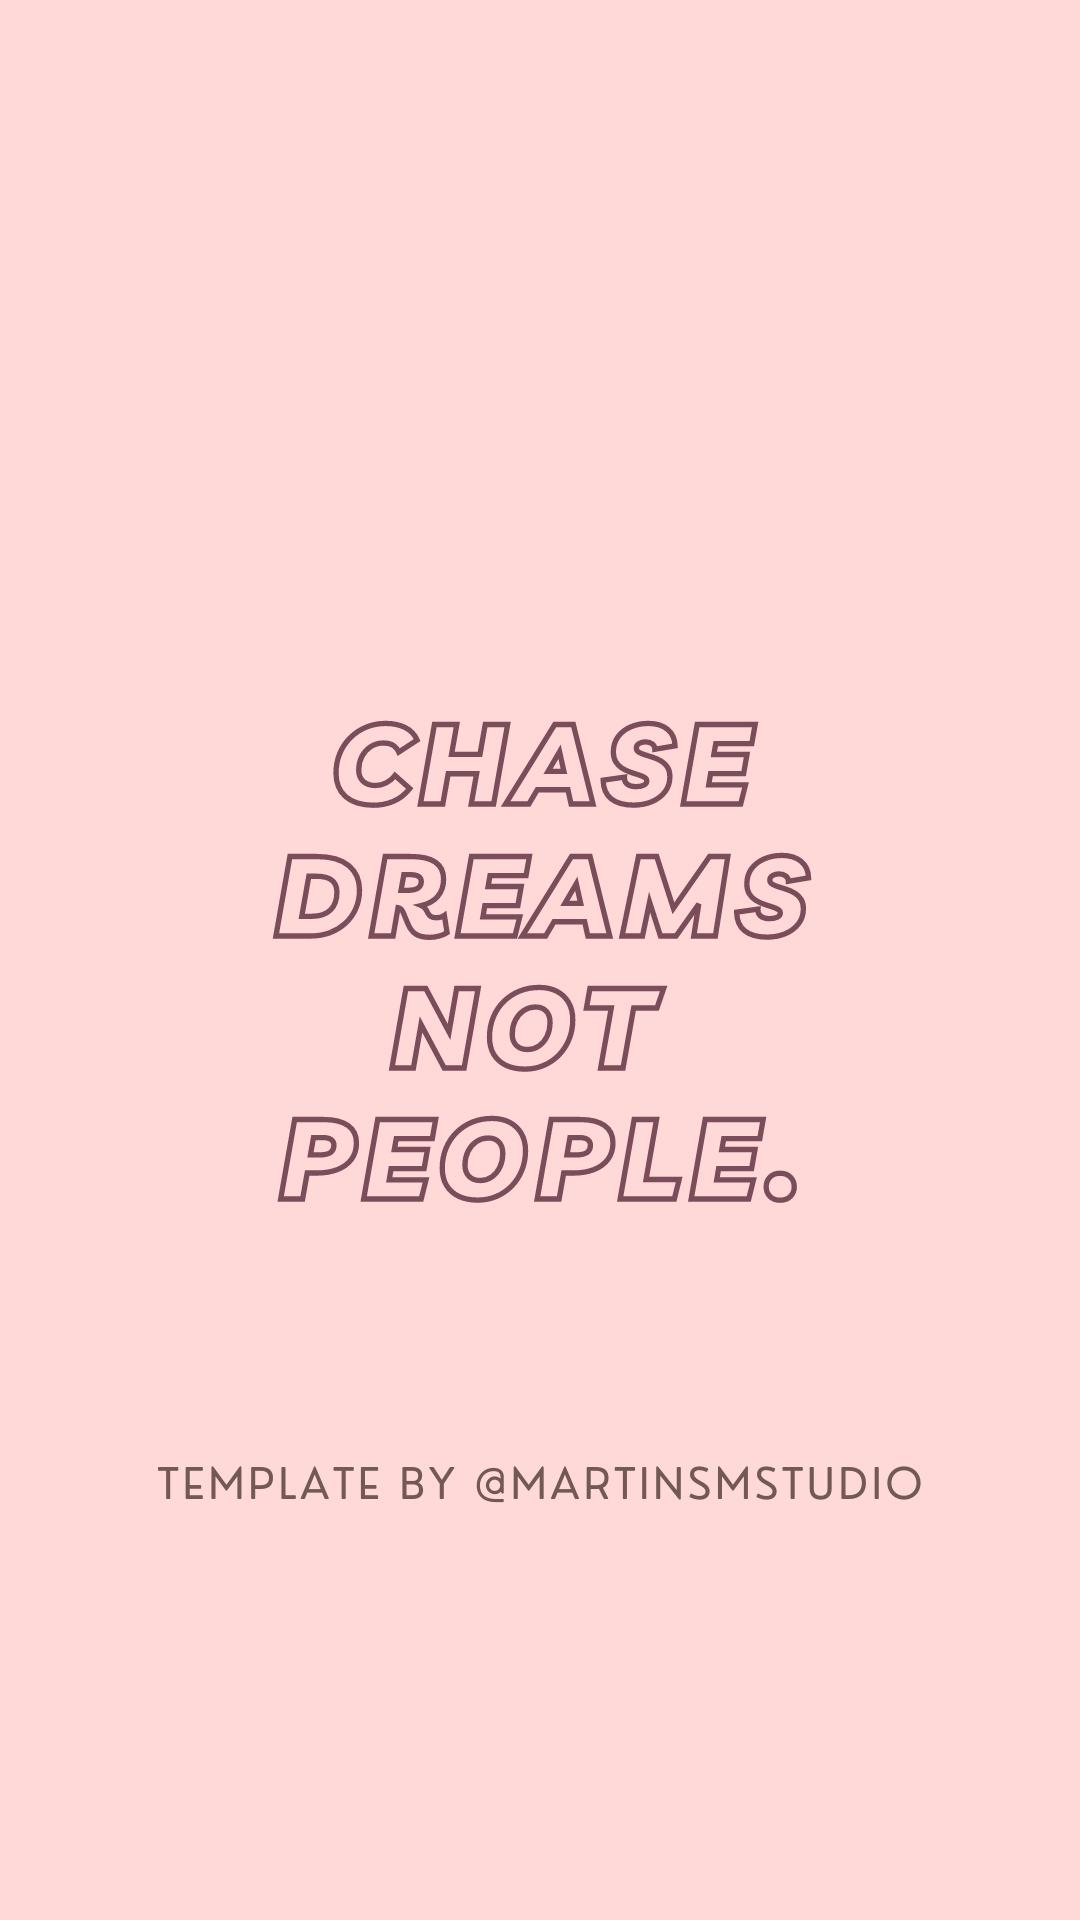 Instagram quotes inspirational, Female boss quotes, boss babe, Boss babe quotes confidence